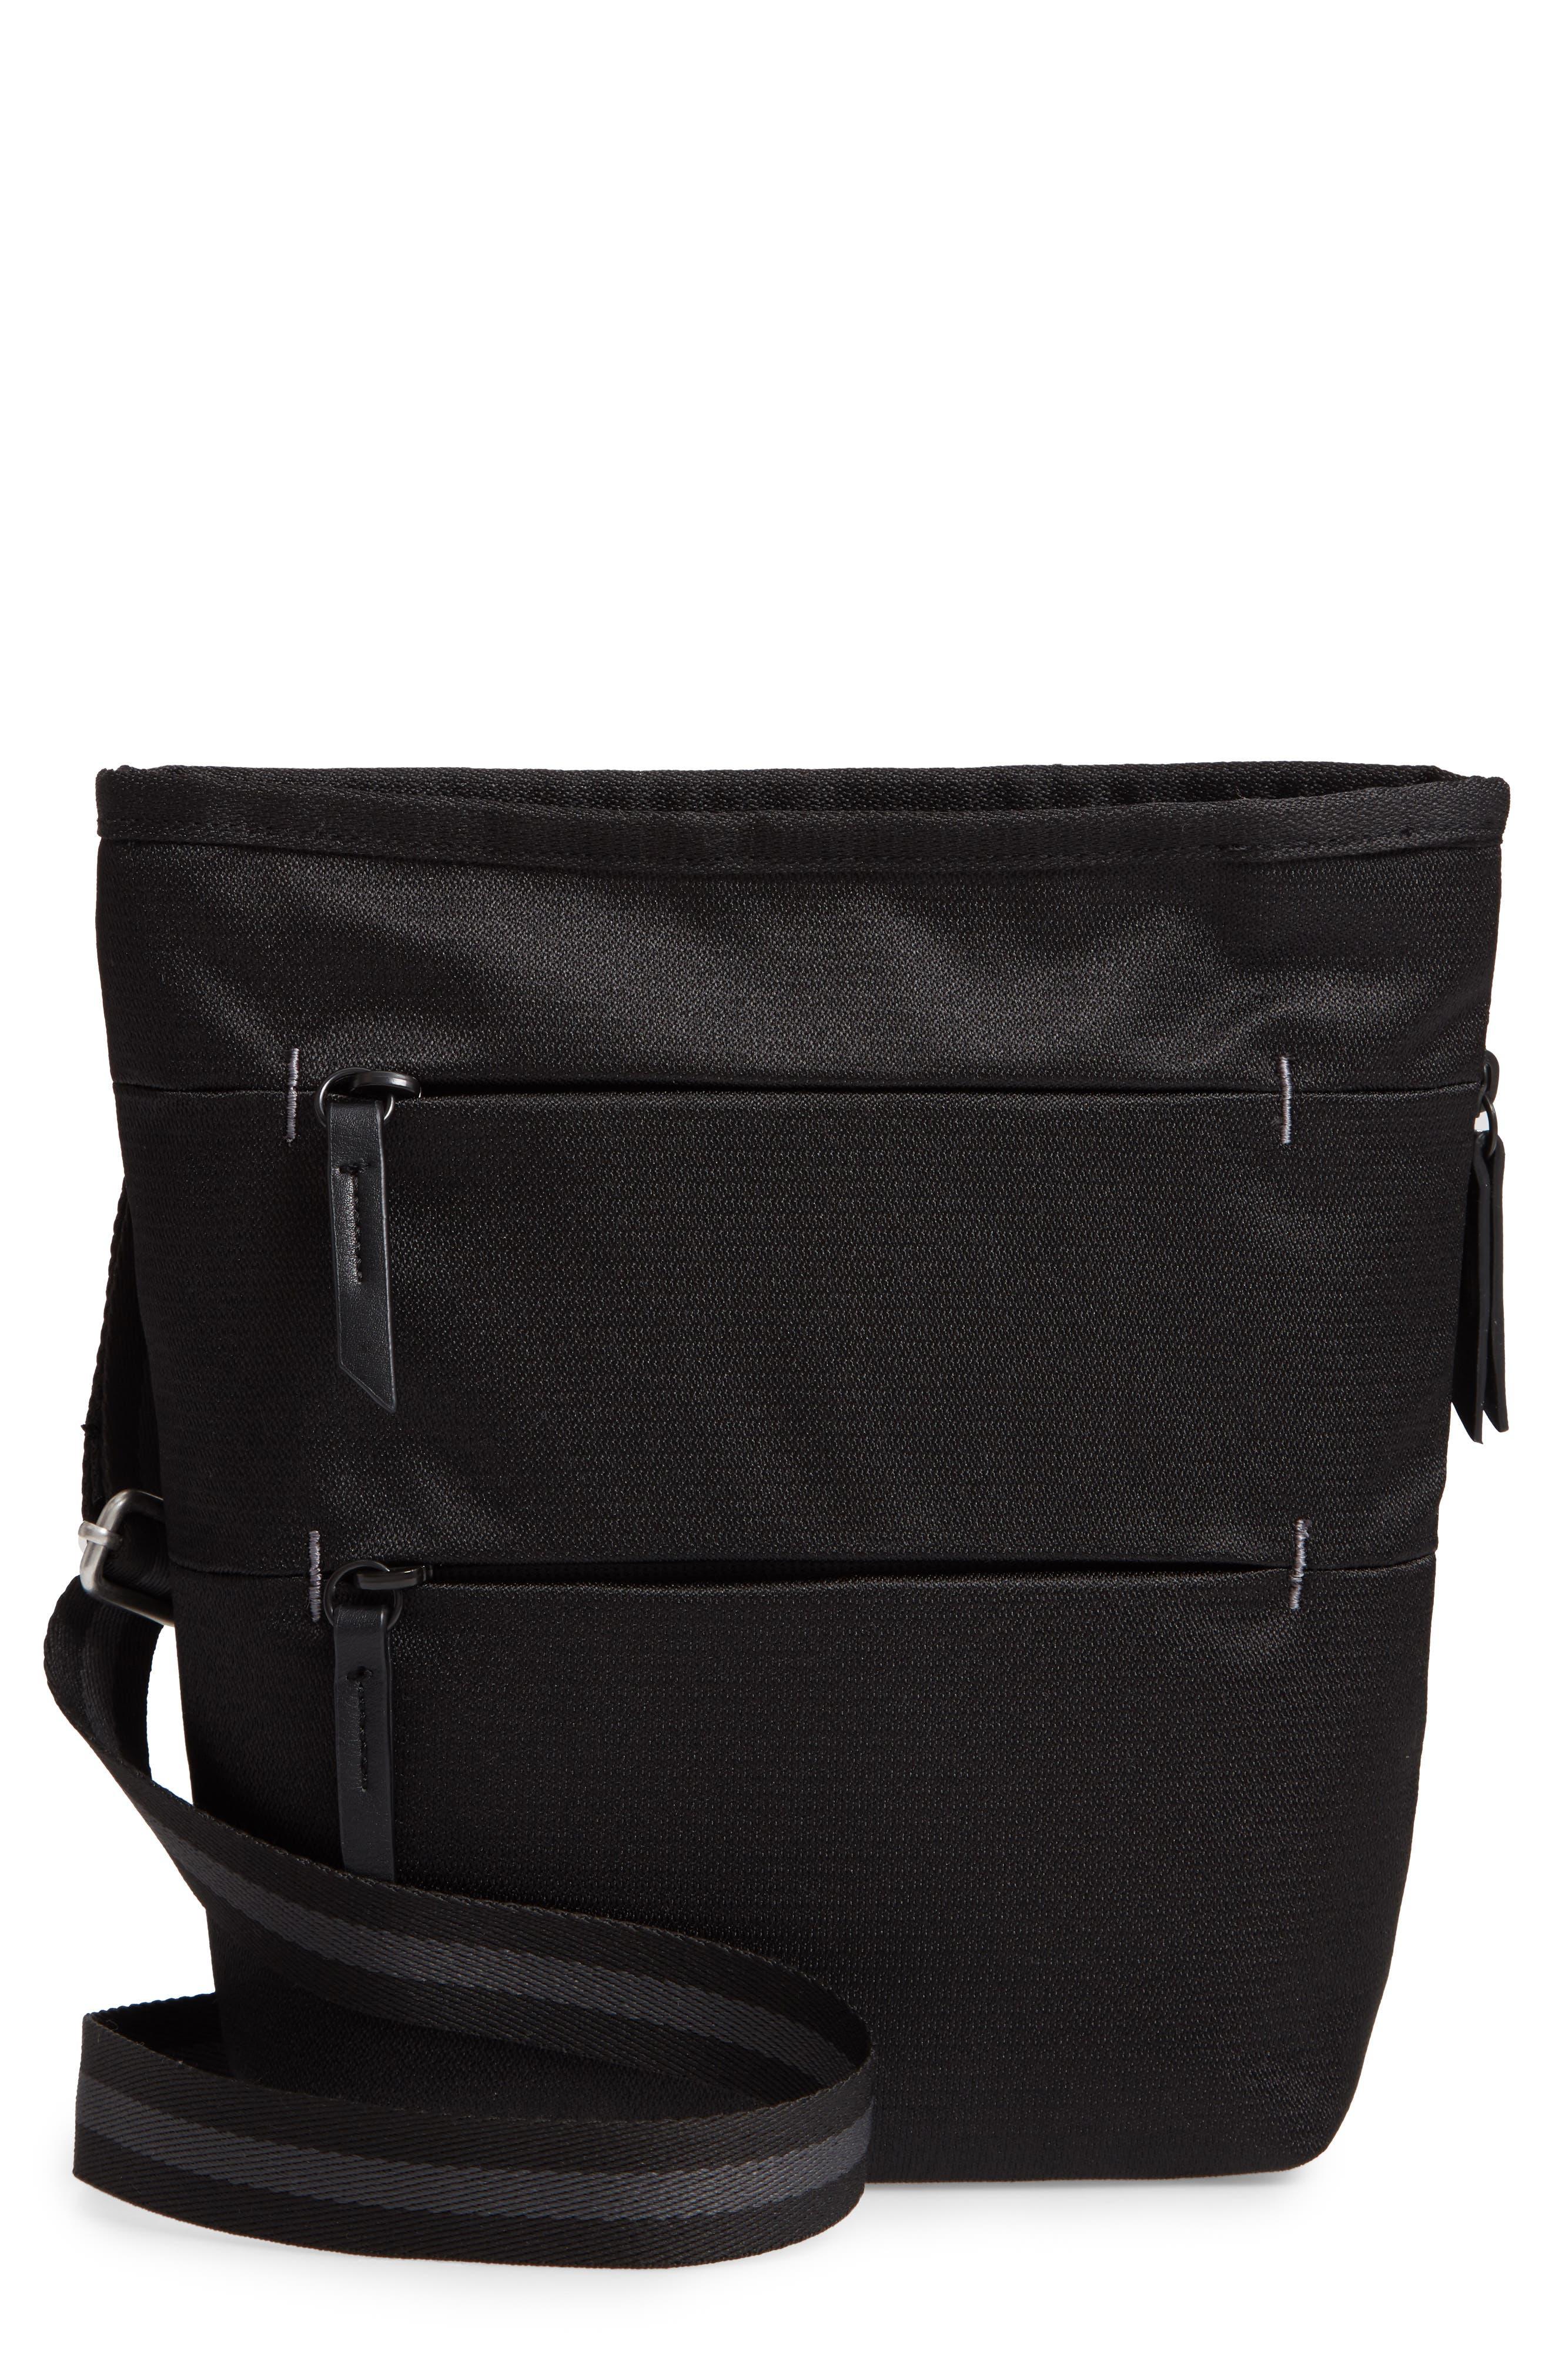 Sadie Medium RFID Crossbody Bag,                             Main thumbnail 1, color,                             BLACK/ BLACK